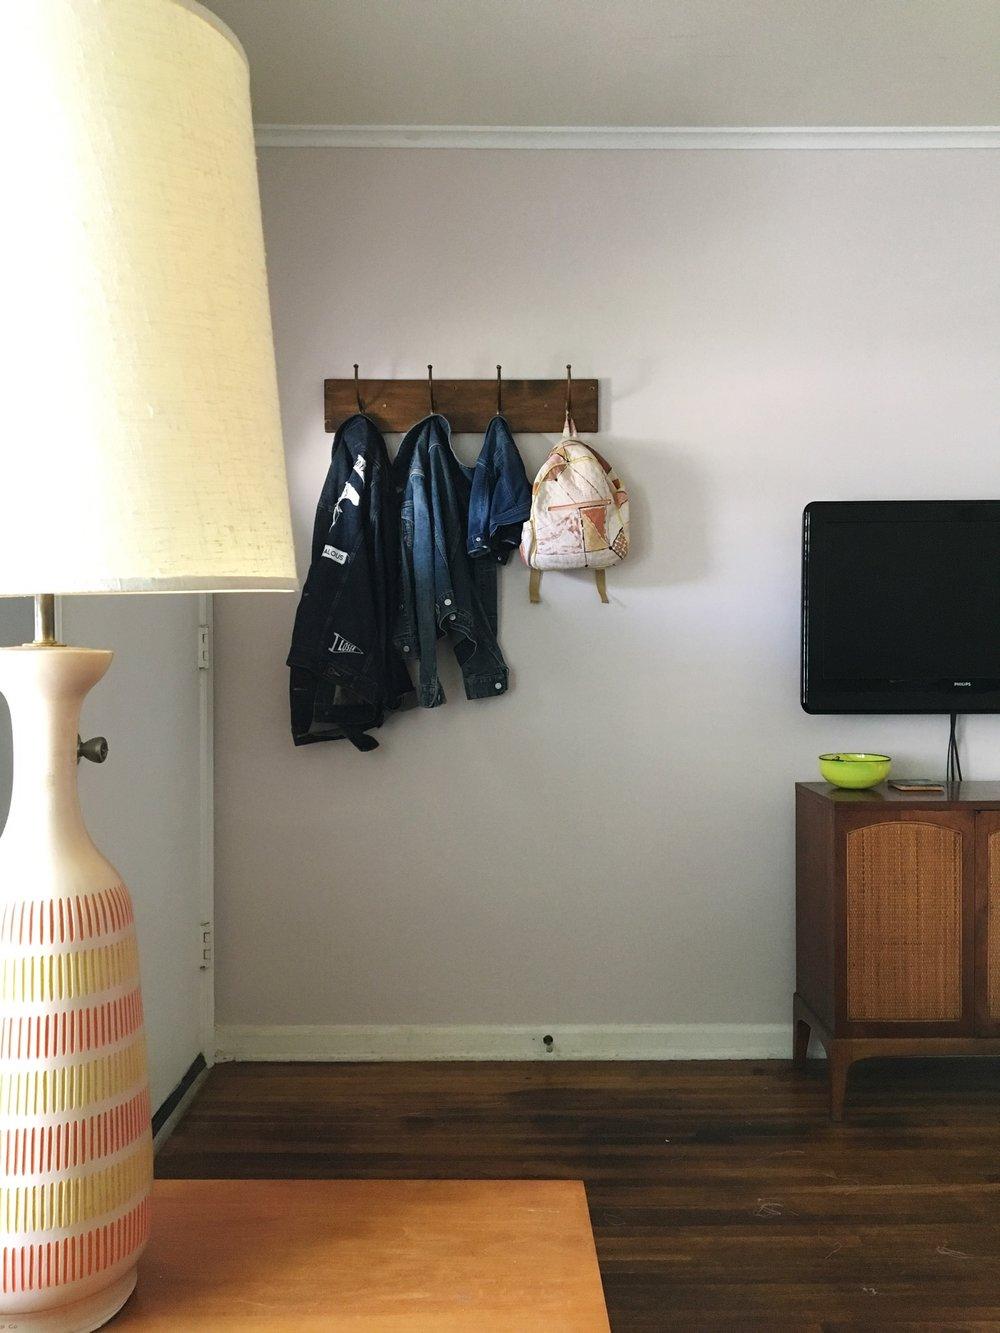 Version 2, pink walls!